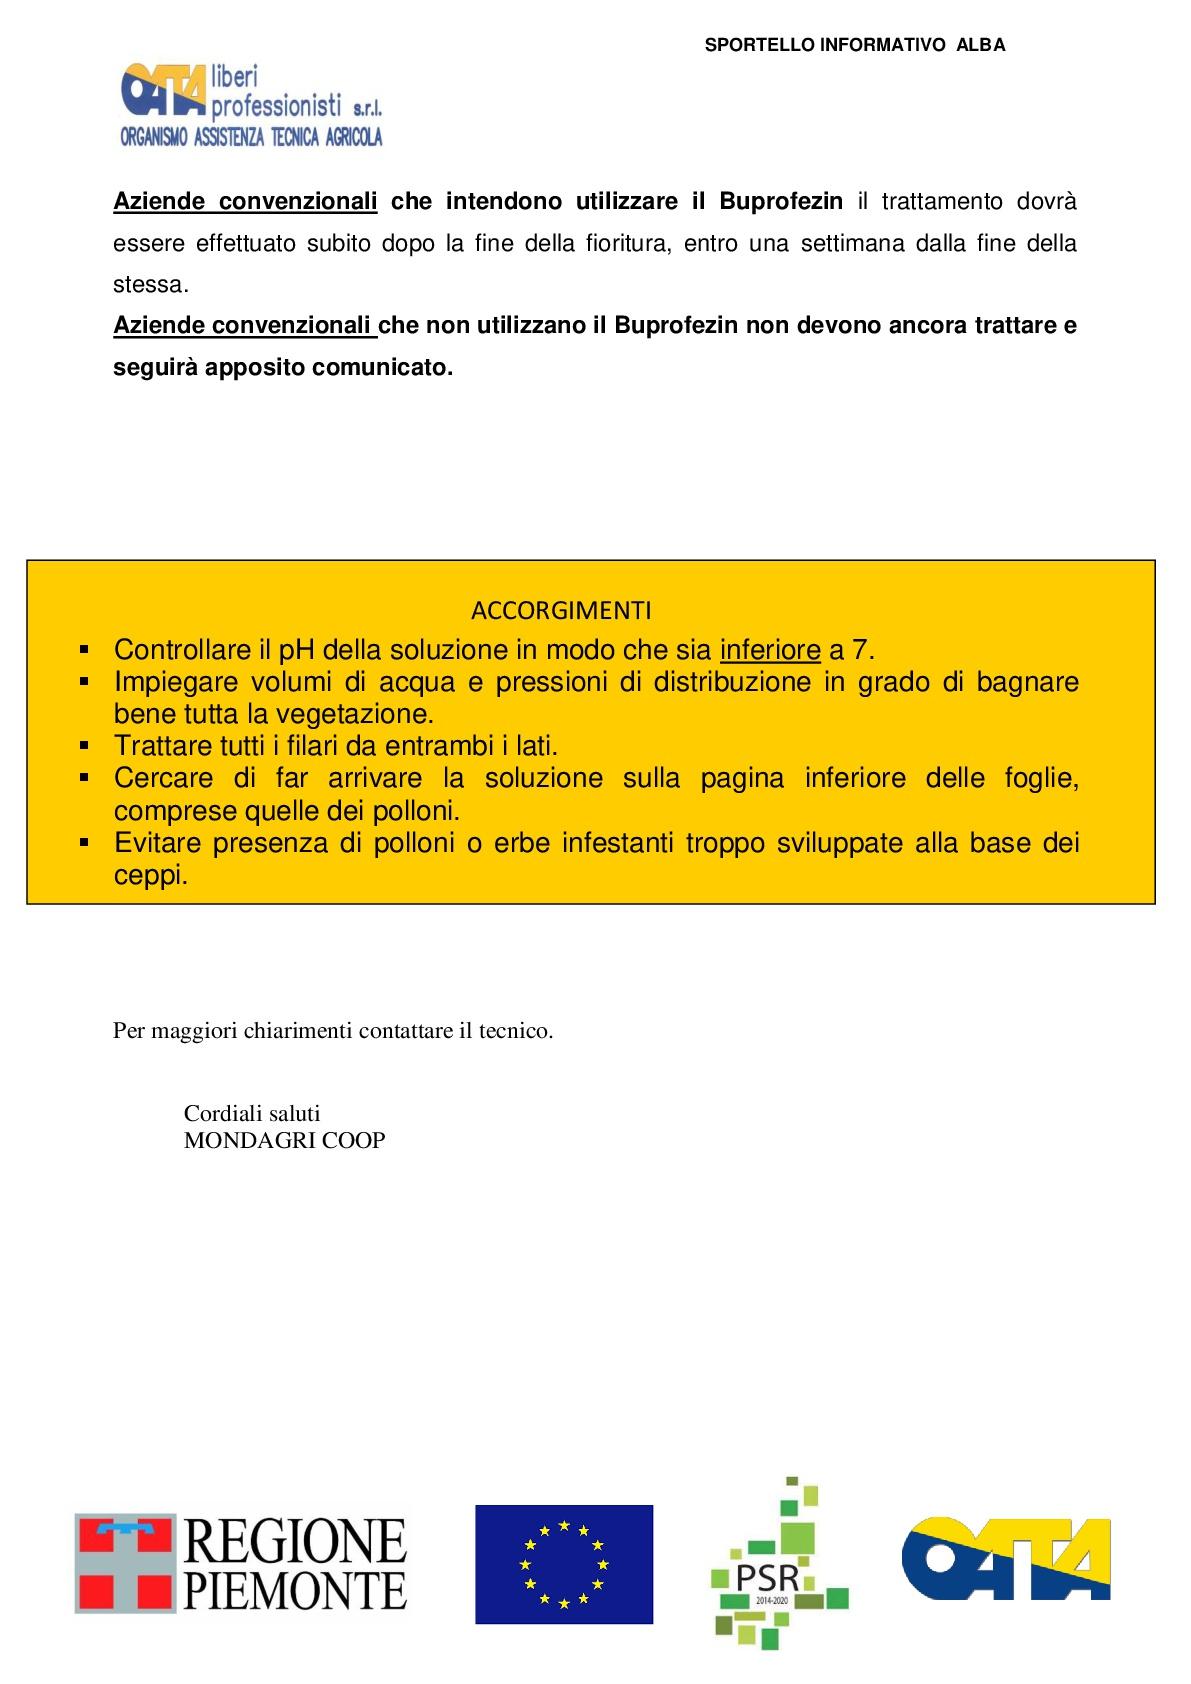 bollettino-vite-6-2017-003